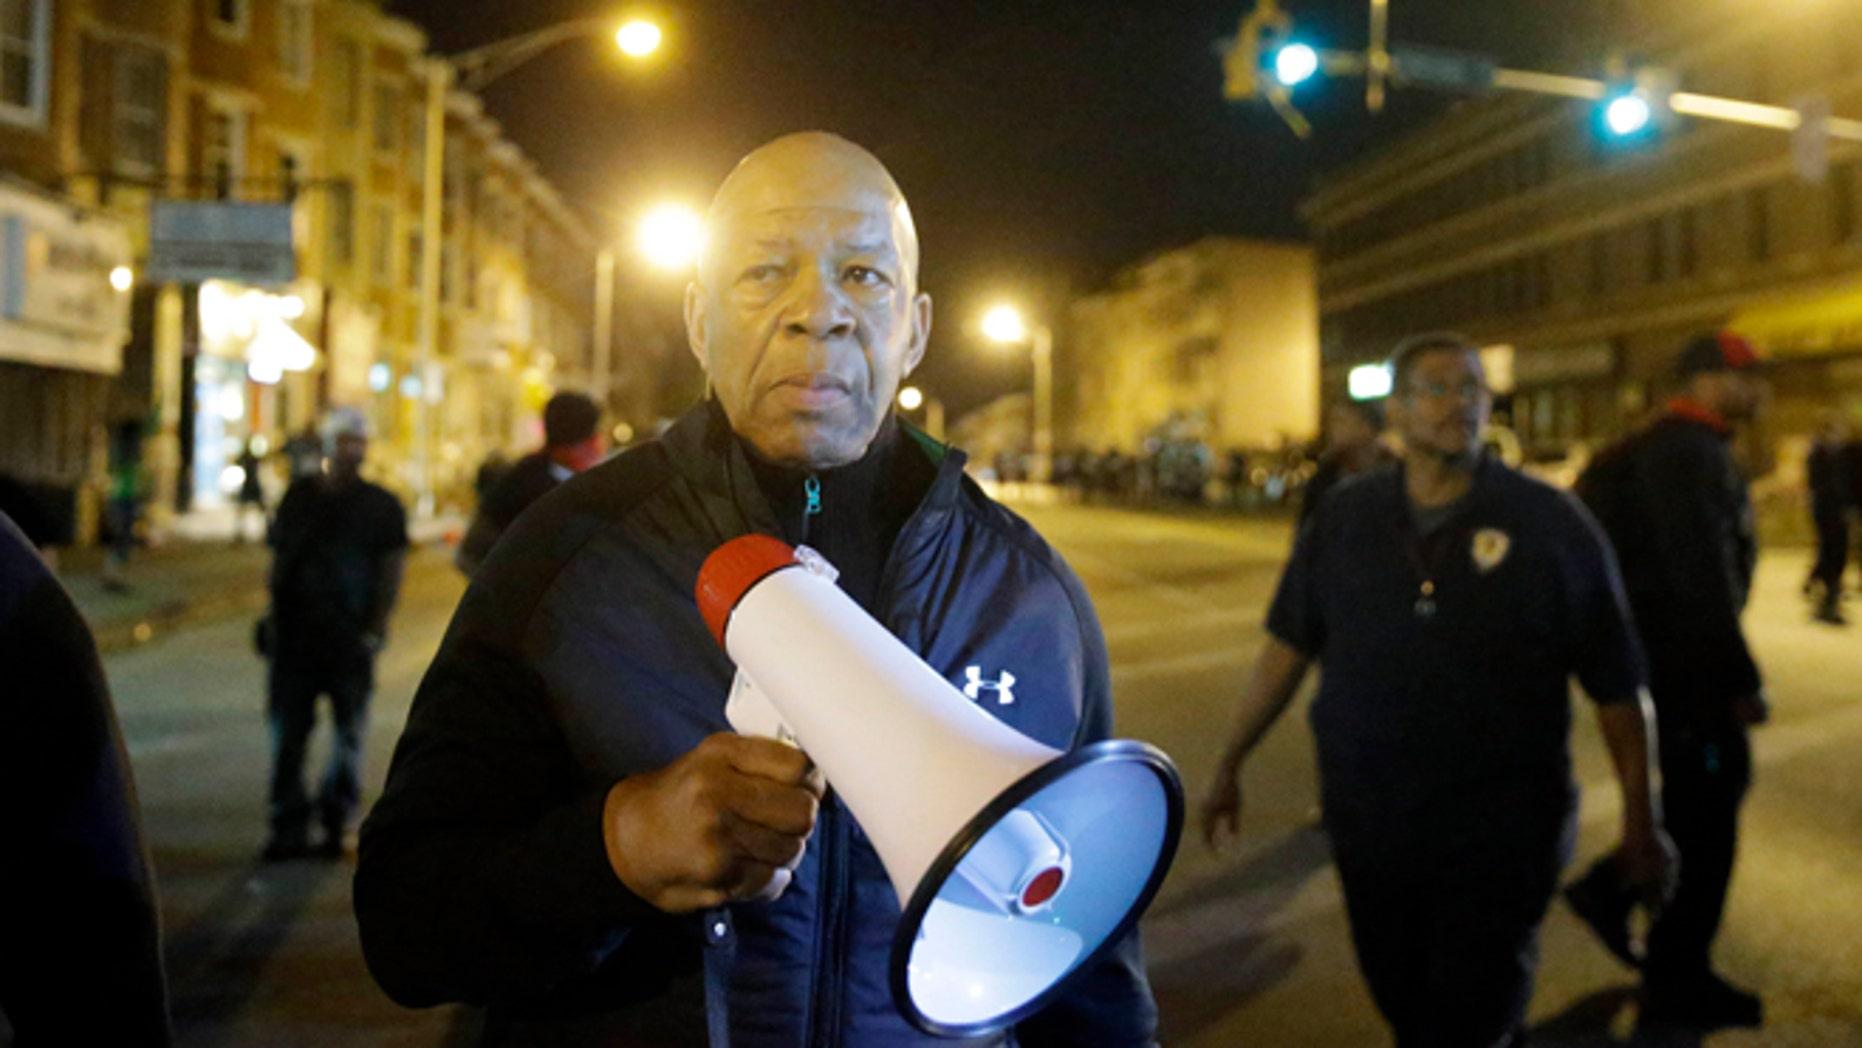 April 29, 2015: U.S. Rep. Elijah Cummings, D-Md., walks in Baltimore, amid protests over Freddie Gray's death.